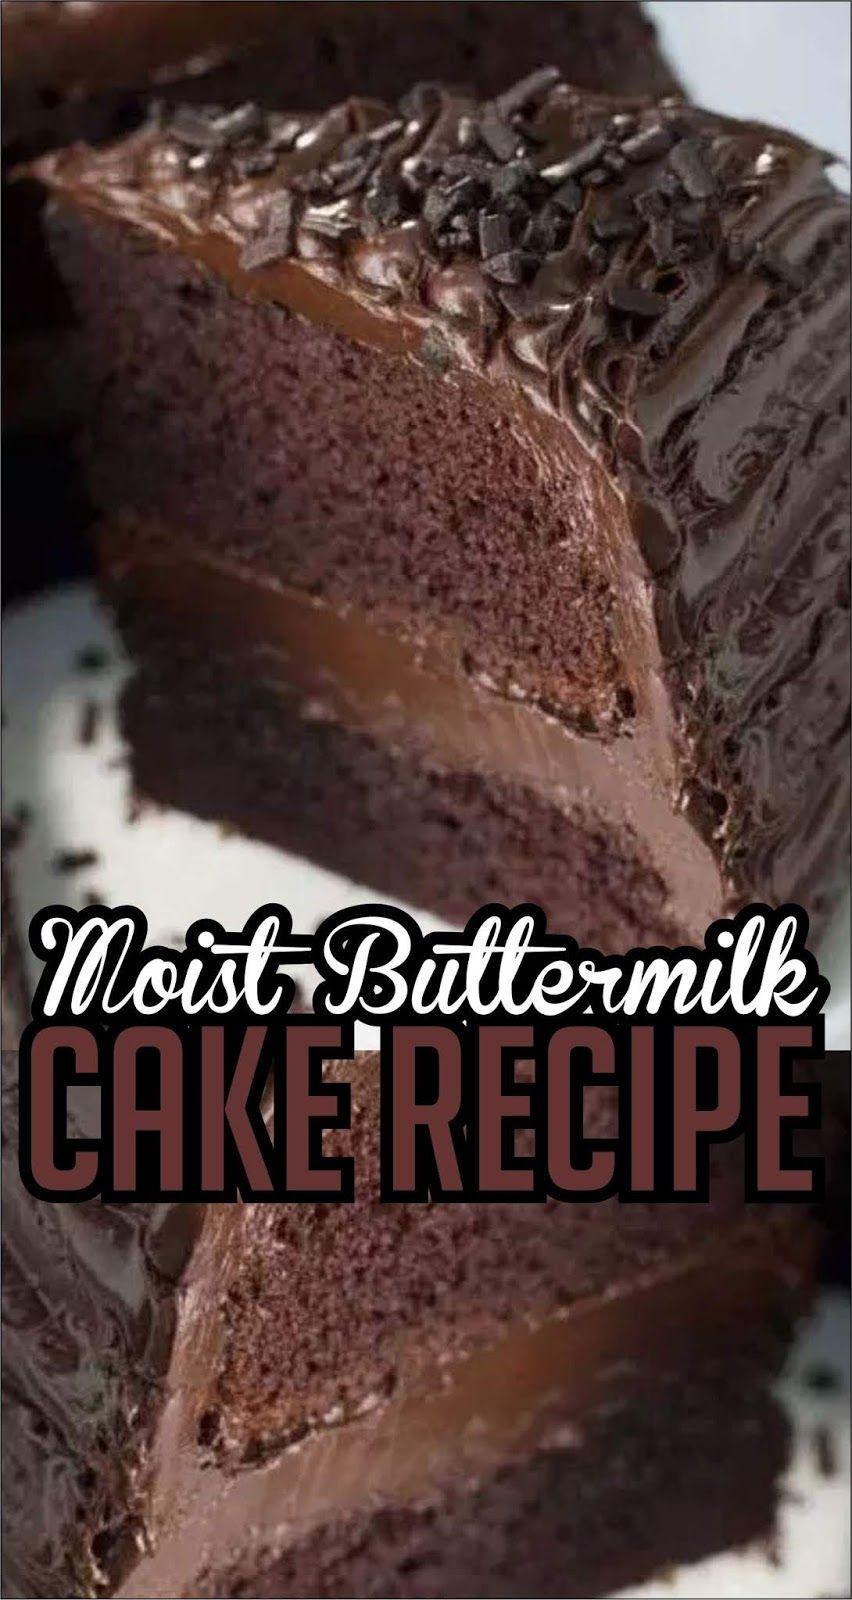 Moist Buttermilk Cake Recipe Yummy Recipes Buttermilk Cake Recipe Chocolate Cake Recipe Moist Moist Chocolate Fudge Cake Recipe